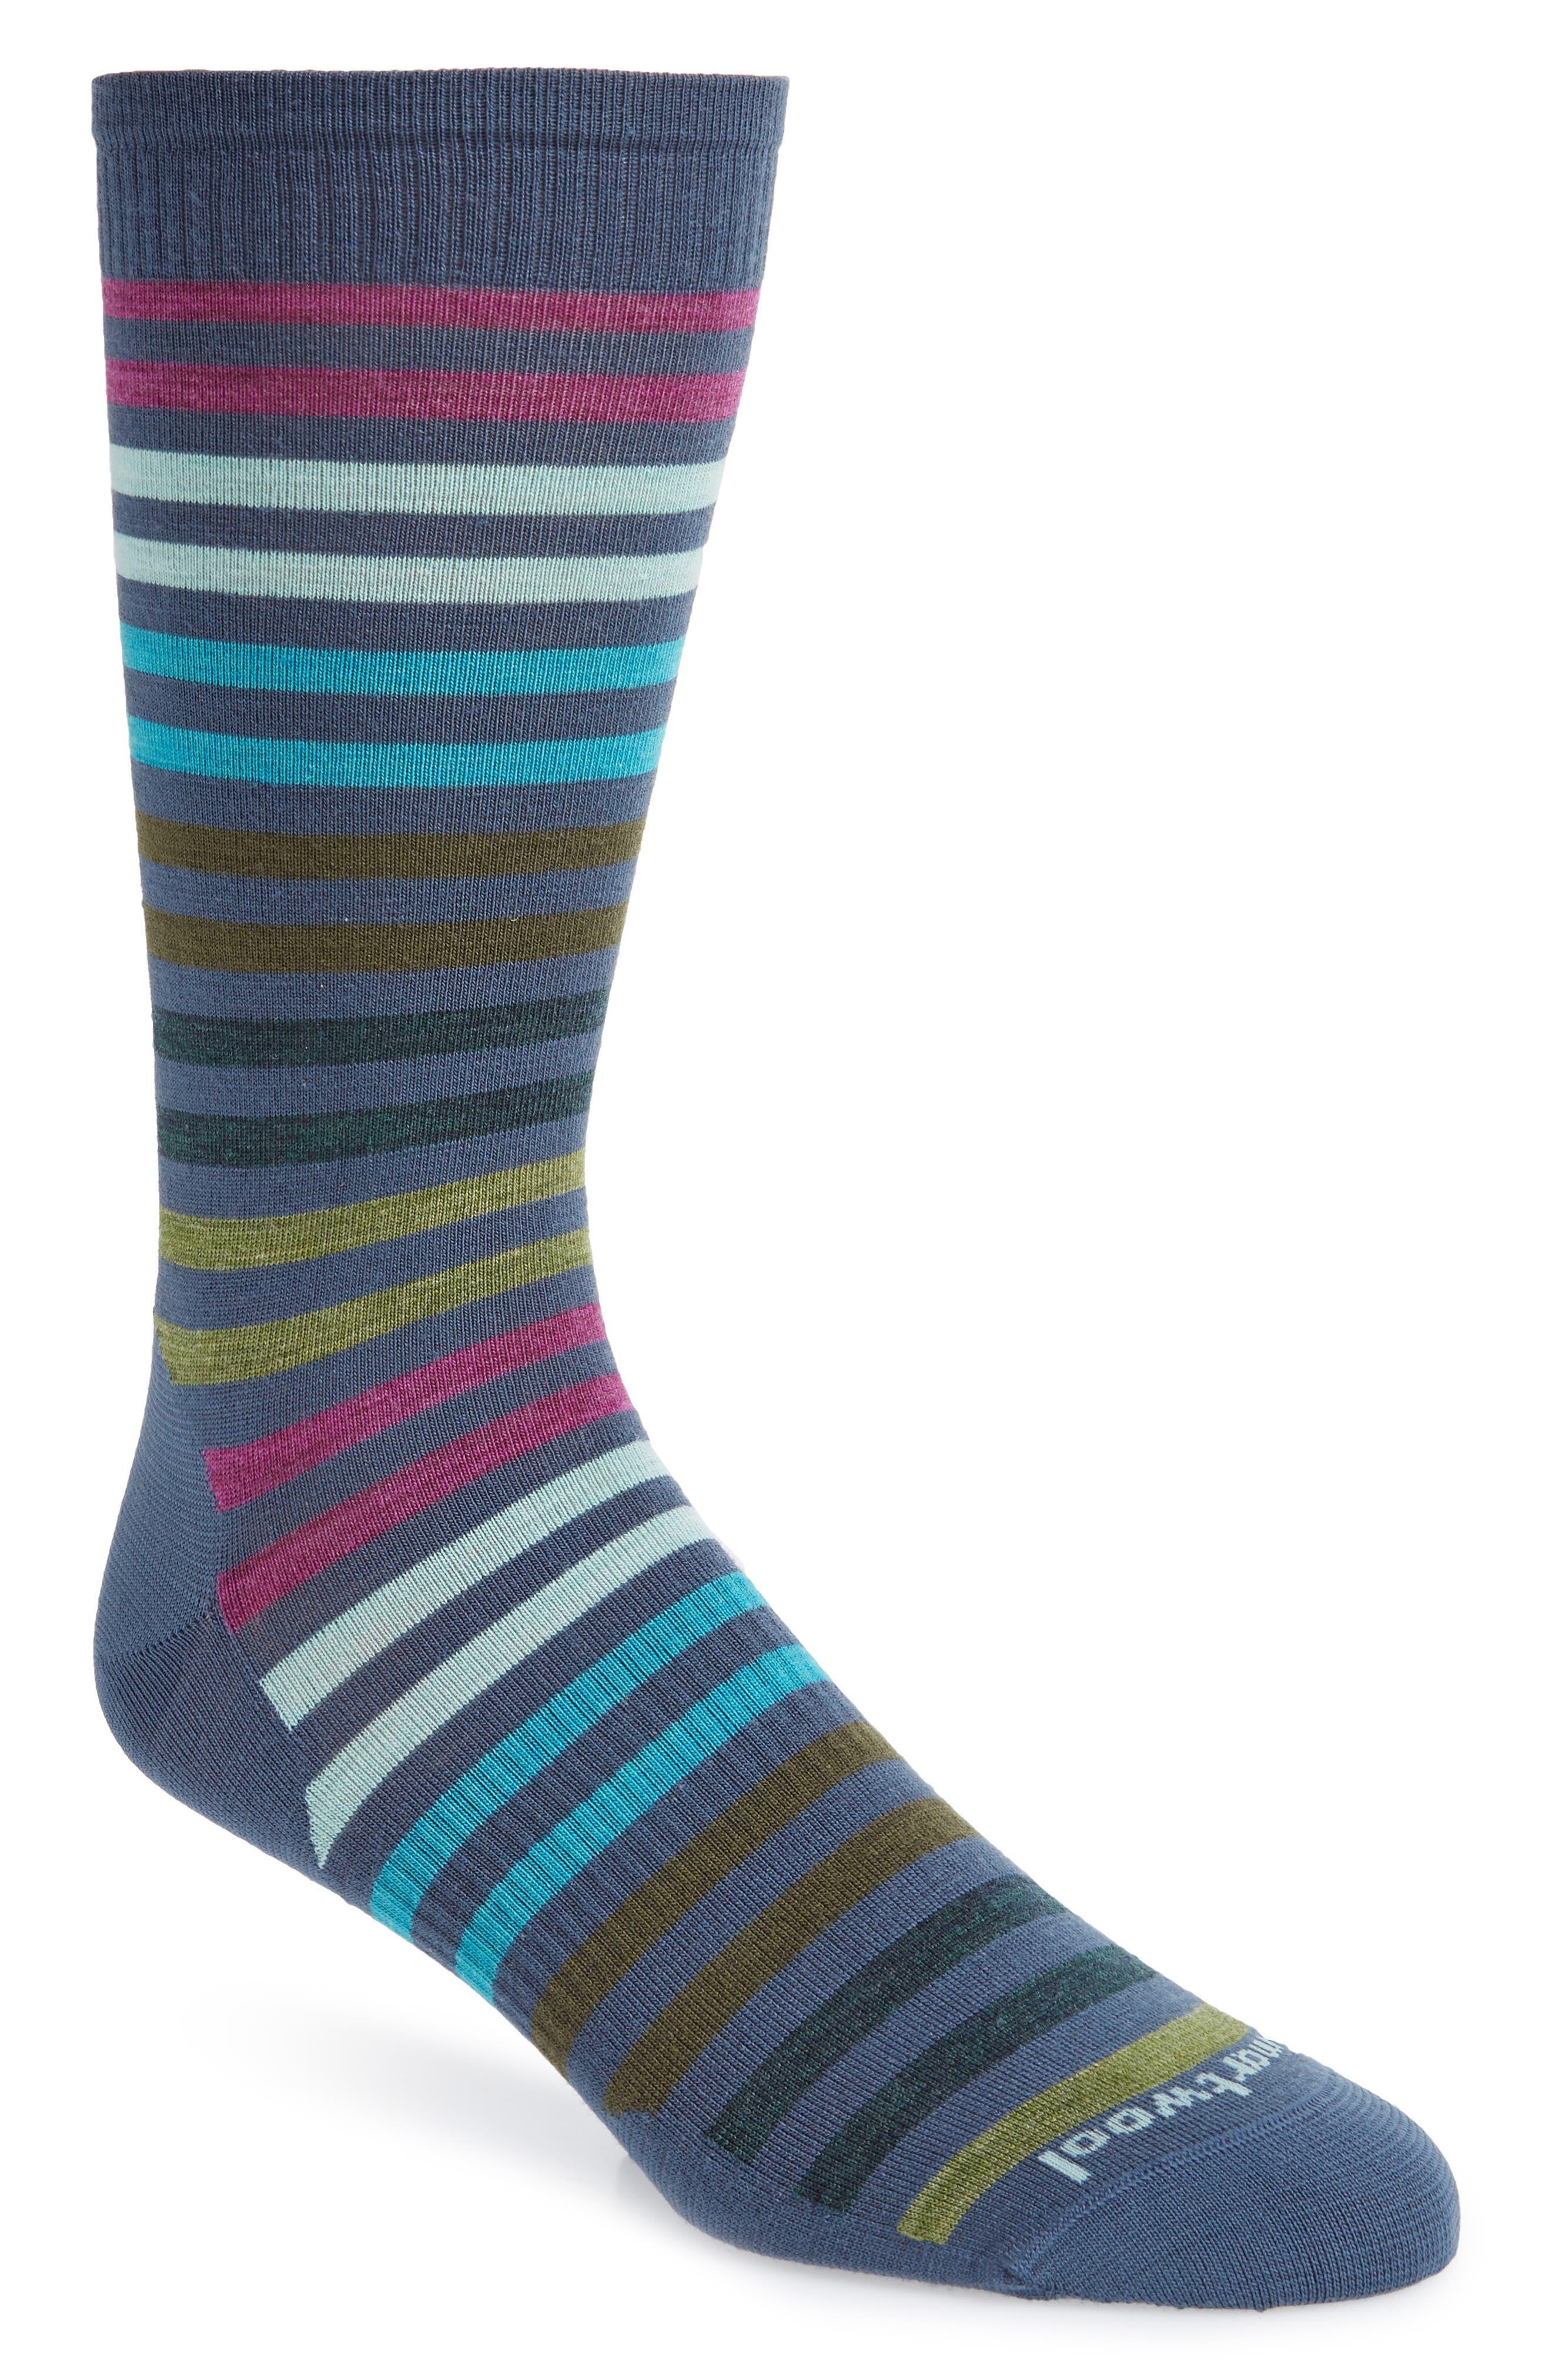 SMARTWOOL 'Spruce Street' Stripe Merino Wool Blend Socks, Main, color, DARK BLUE STEEL HEATHER